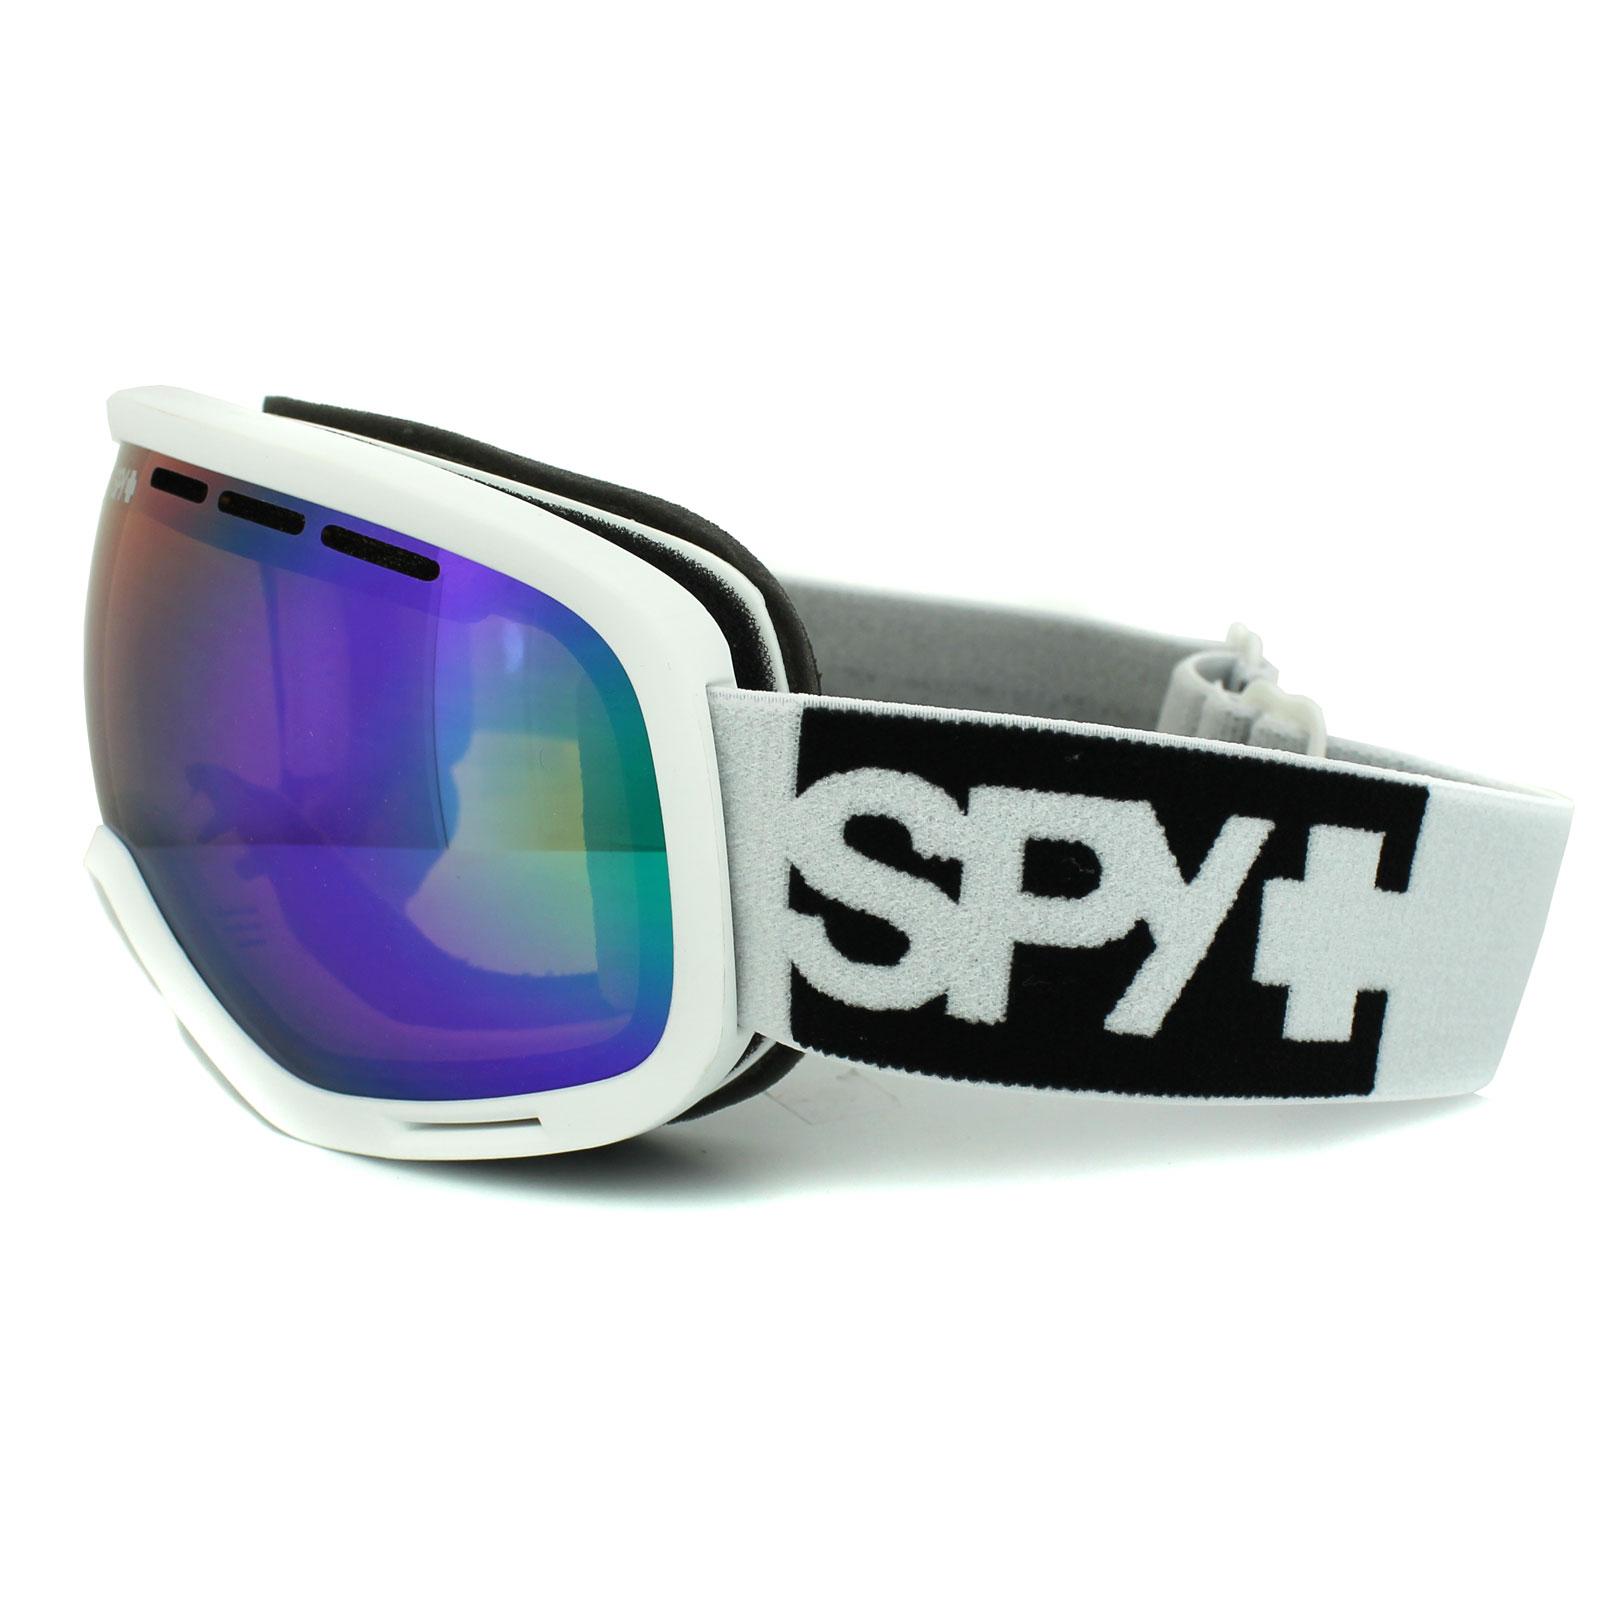 1922dd506d5 Sentinel Spy Ski Snow Goggles Marshall White Bronze w  Green Spectra